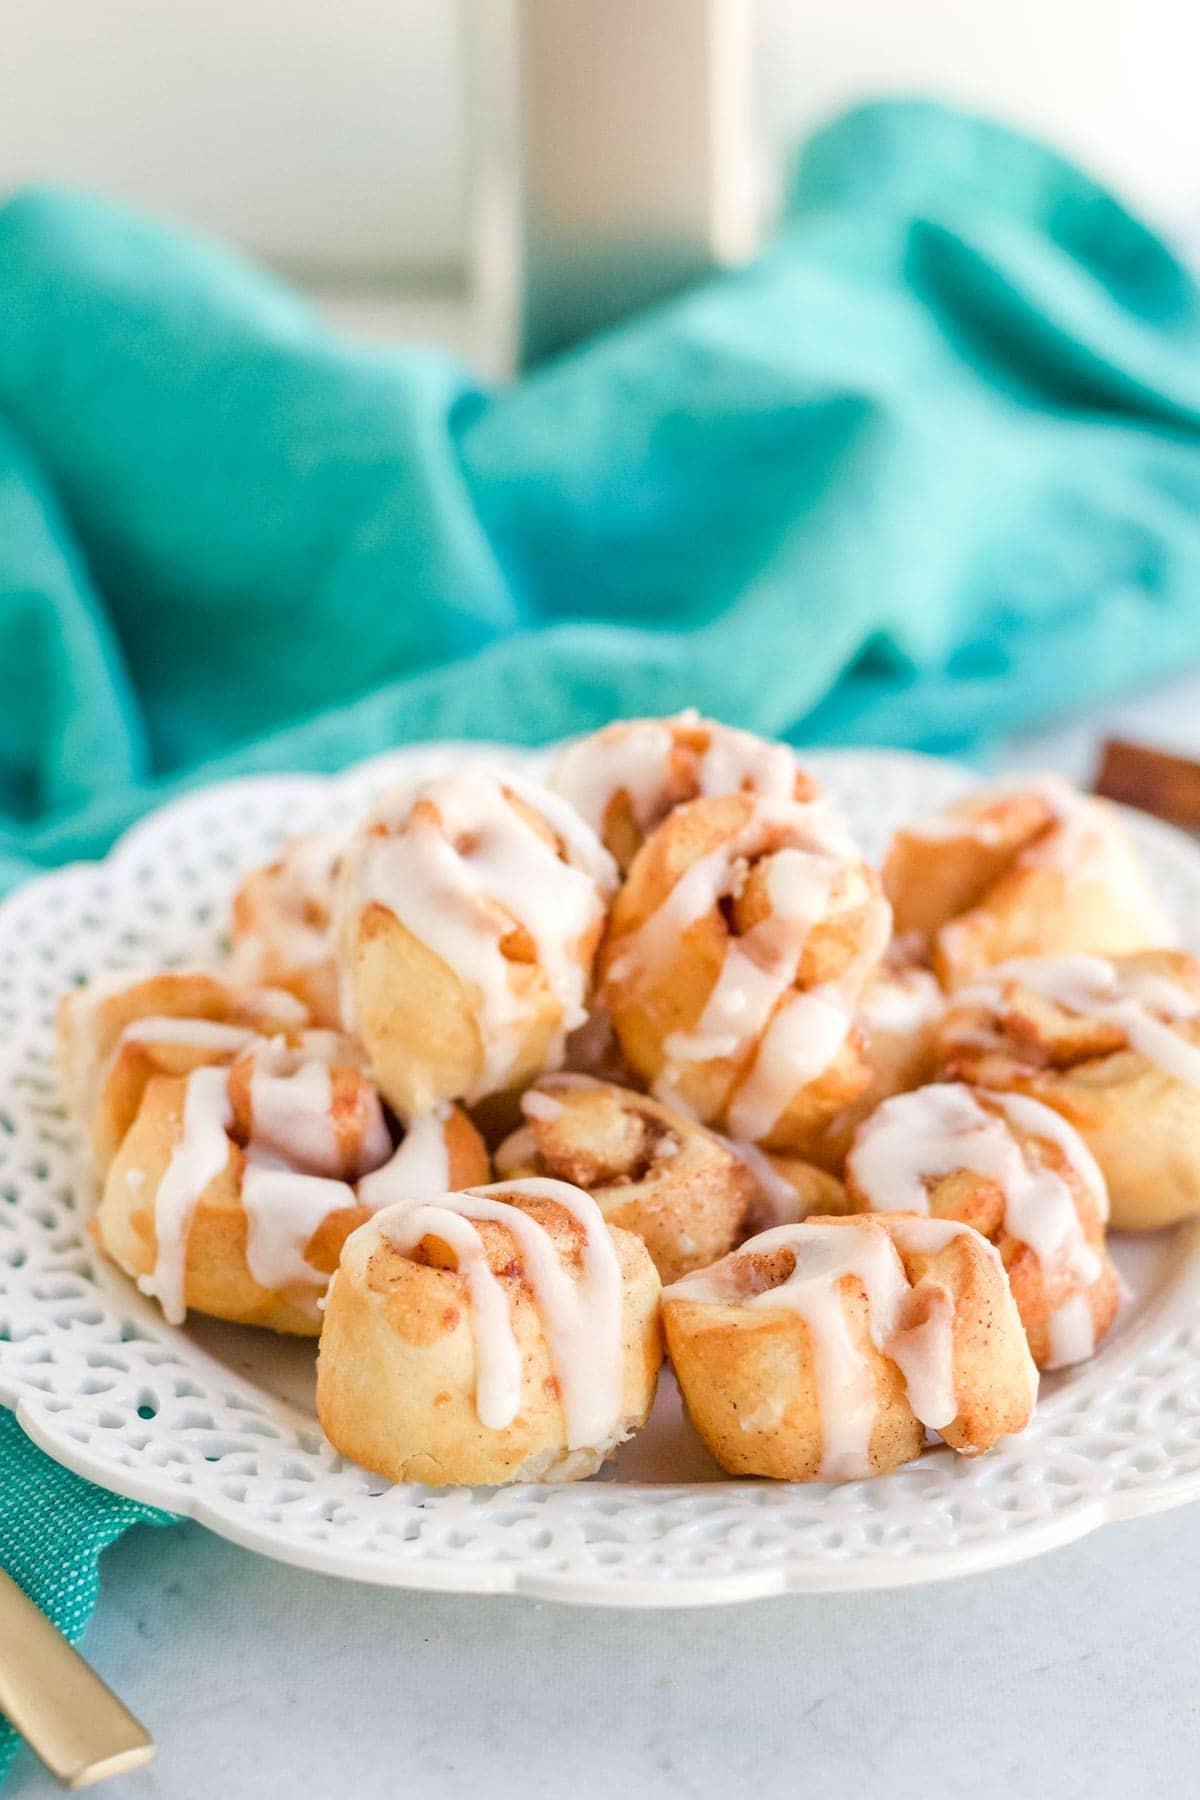 mini cinnamon rolls on a white platter, blue towel, air fryer